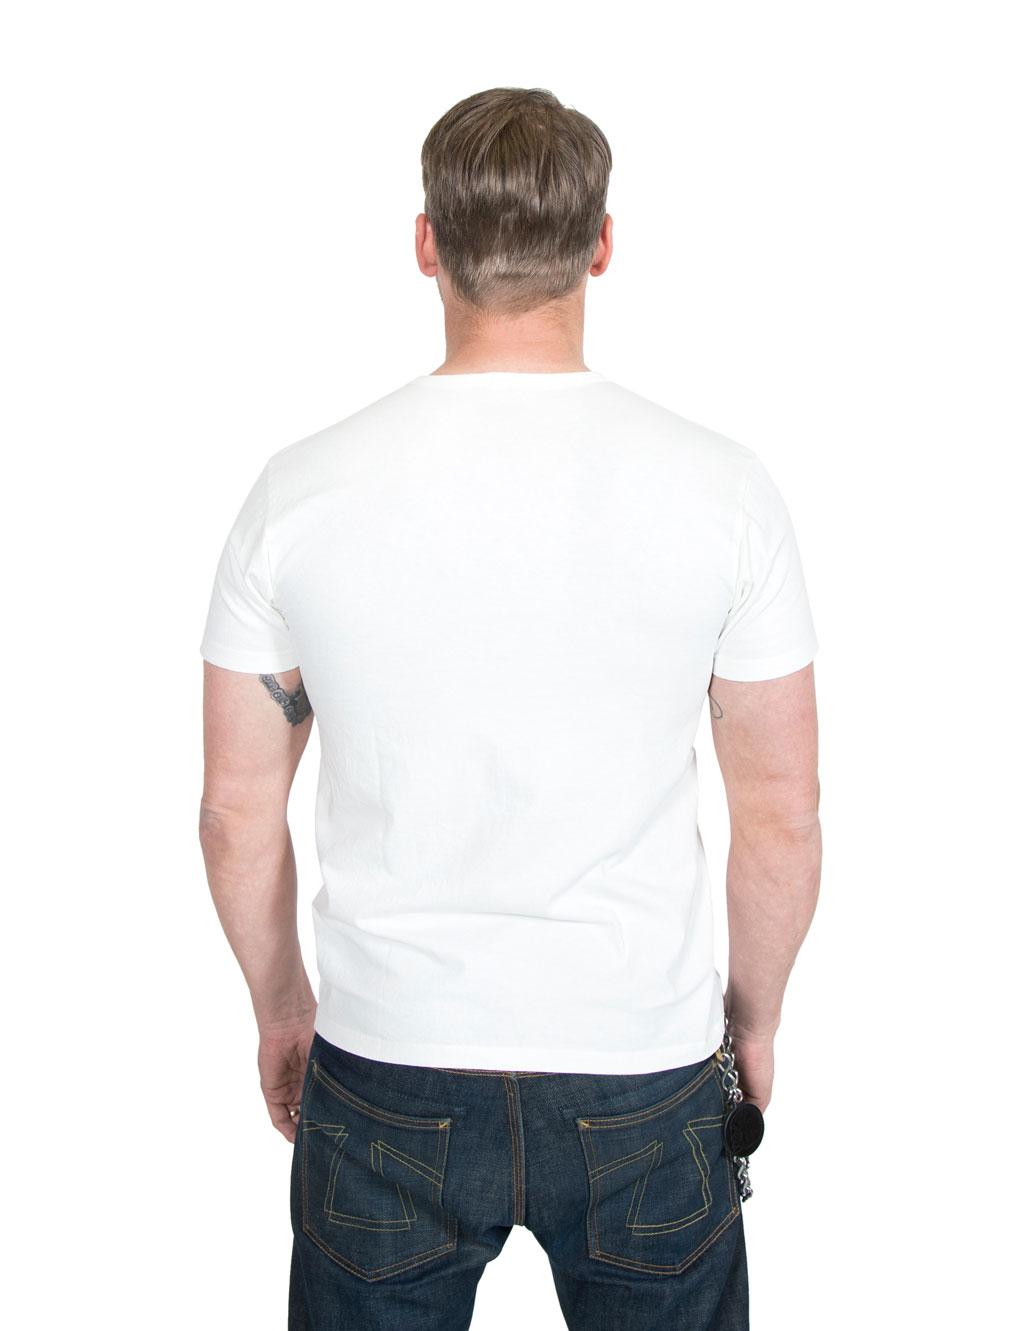 5170e60f Lady White Co. - Our White T-Shirt - White